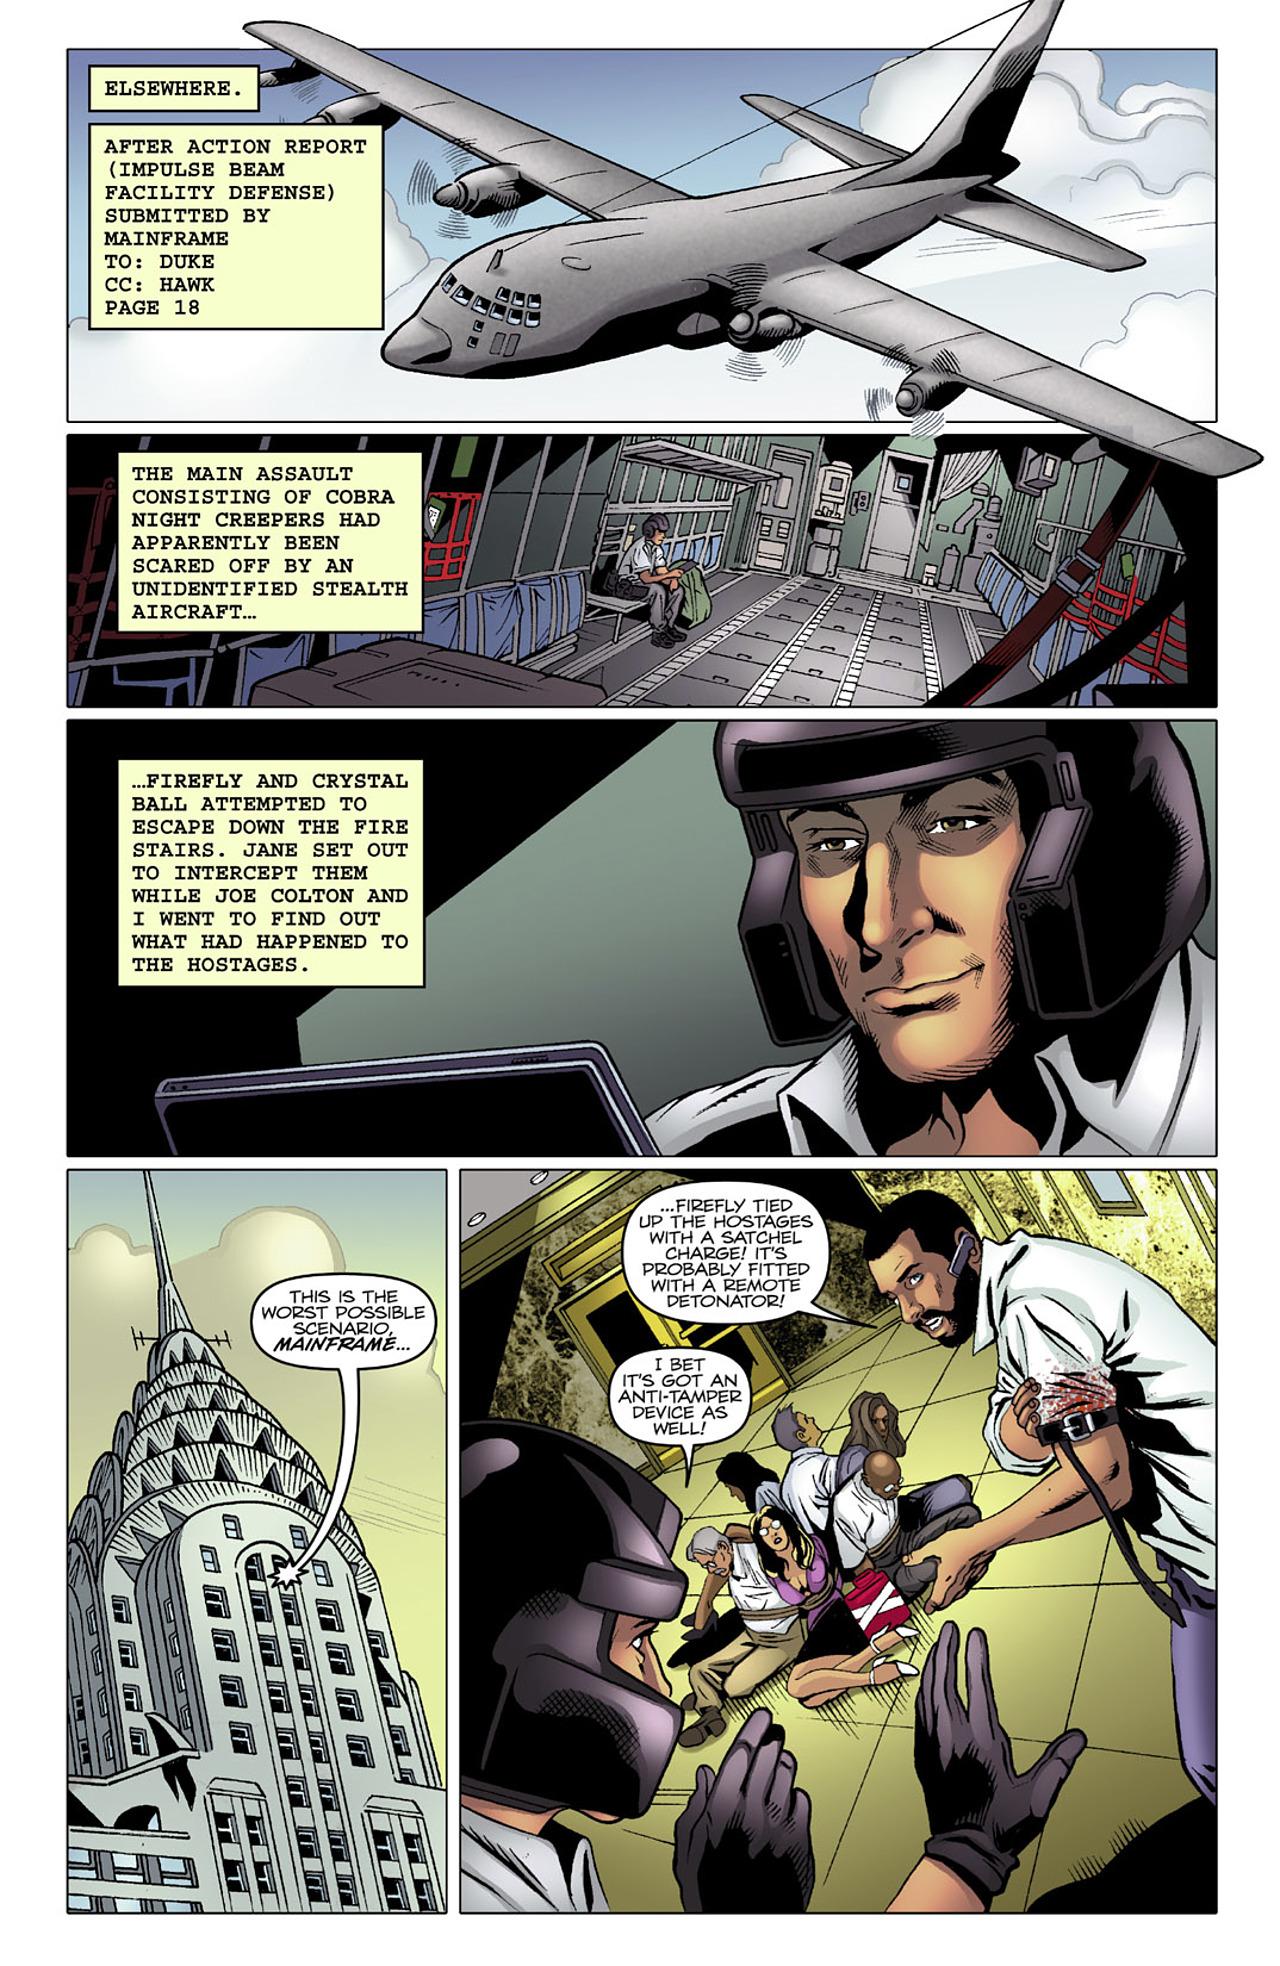 G.I. Joe: A Real American Hero 170 Page 9